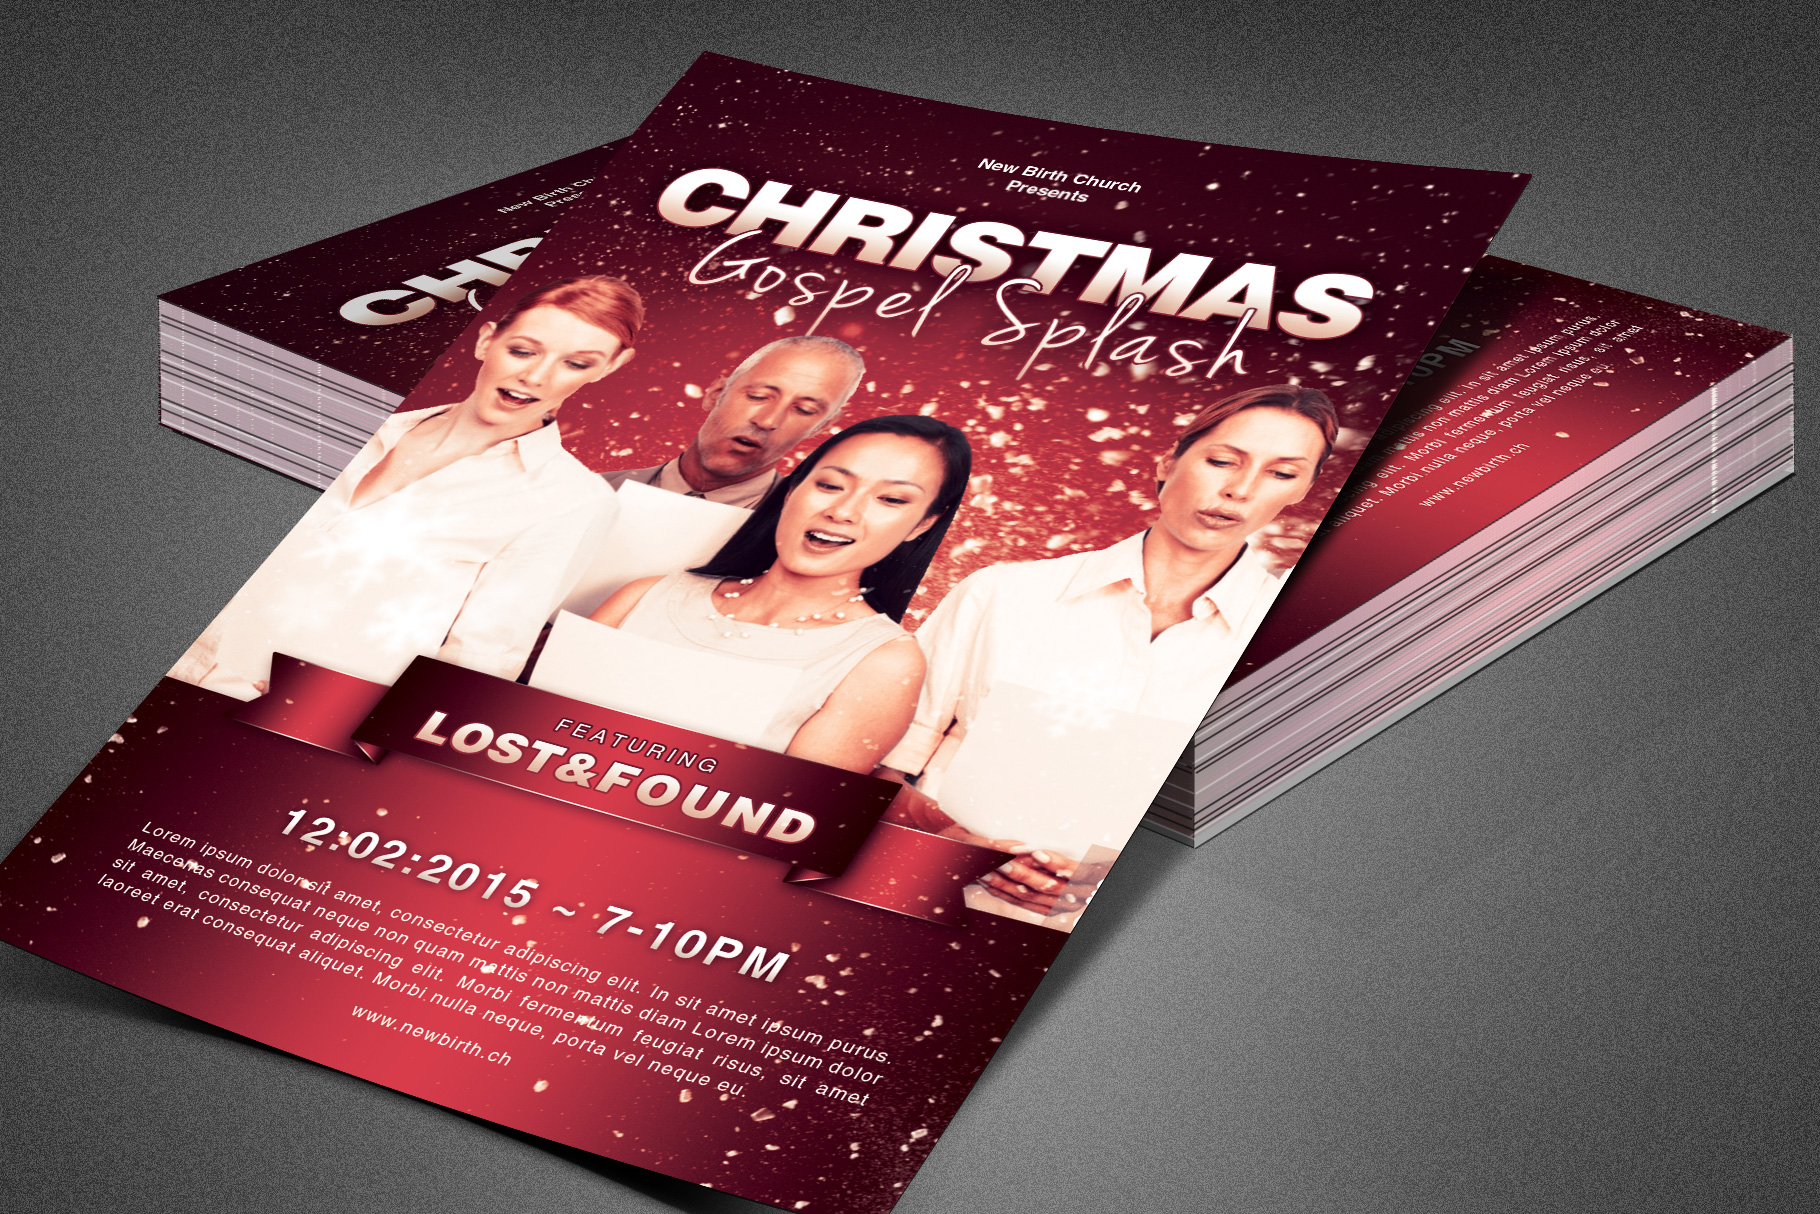 Christmas Gospel Splash Church Flyer example image 1